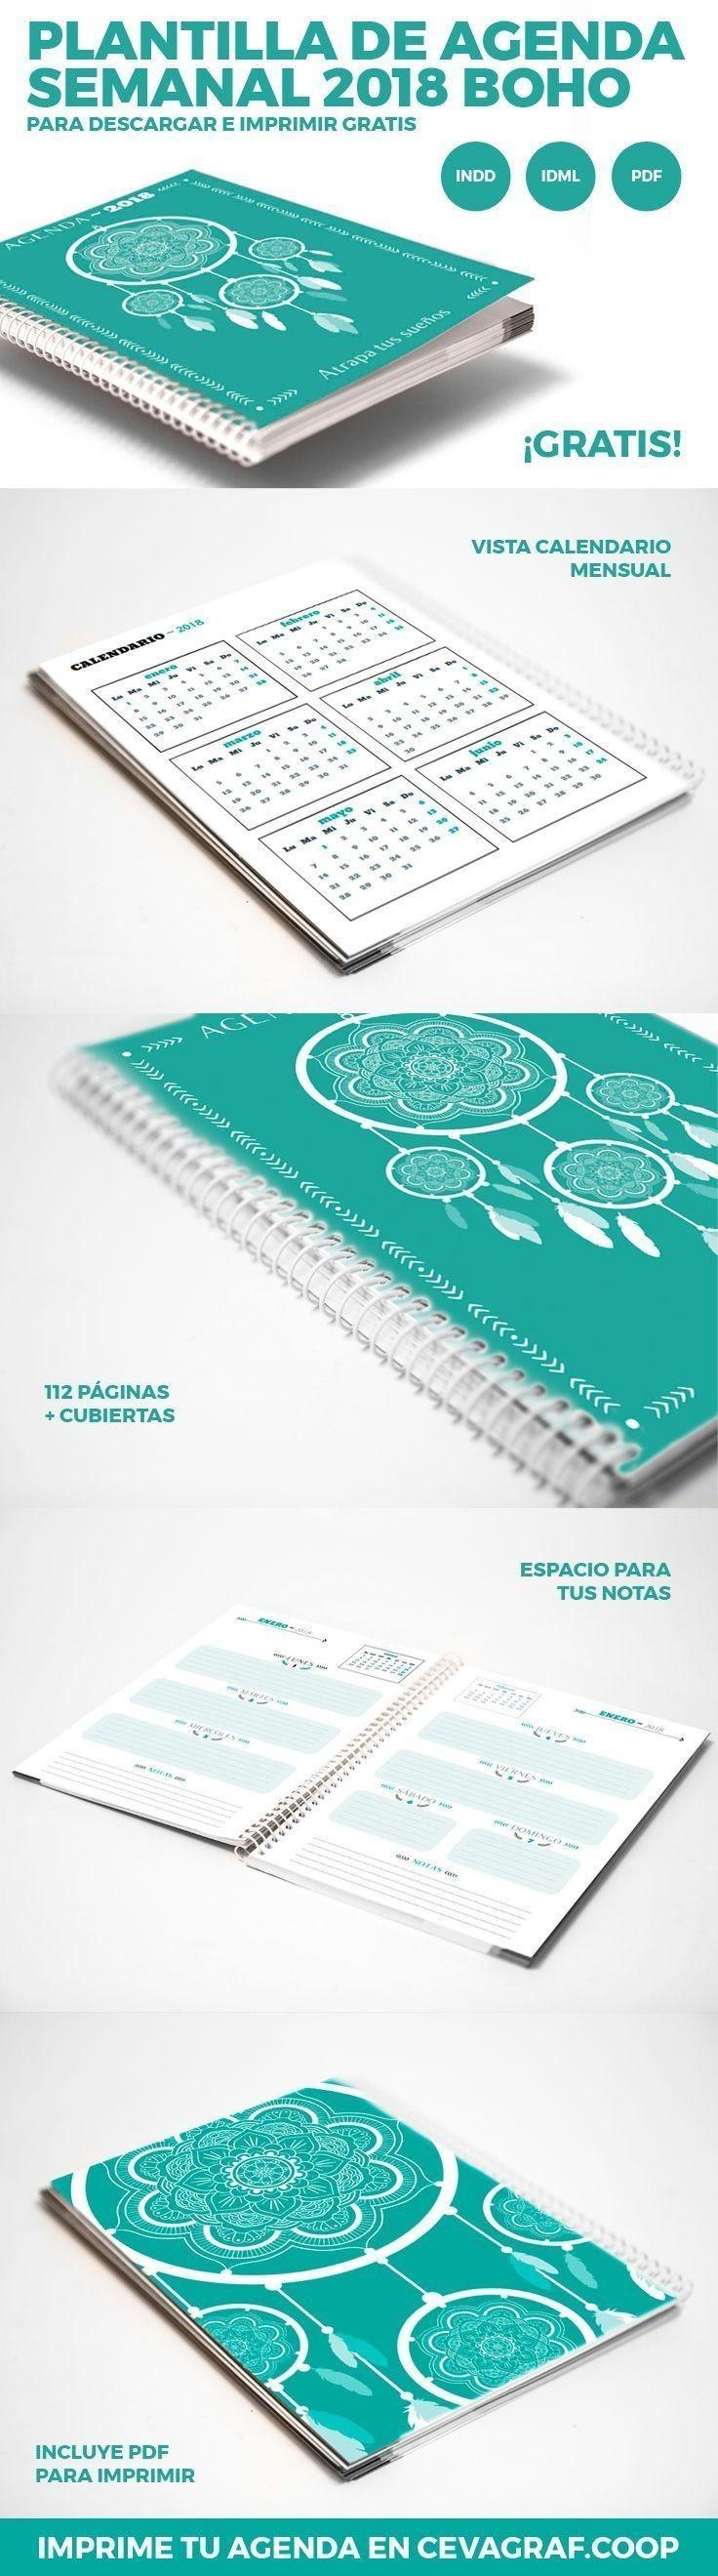 Plantilla de agenda semanal 2018 boho para InDesign ml y dd de Agenda Semanal 2018 Boho 3 Pinterest de calendario imprimir 2017